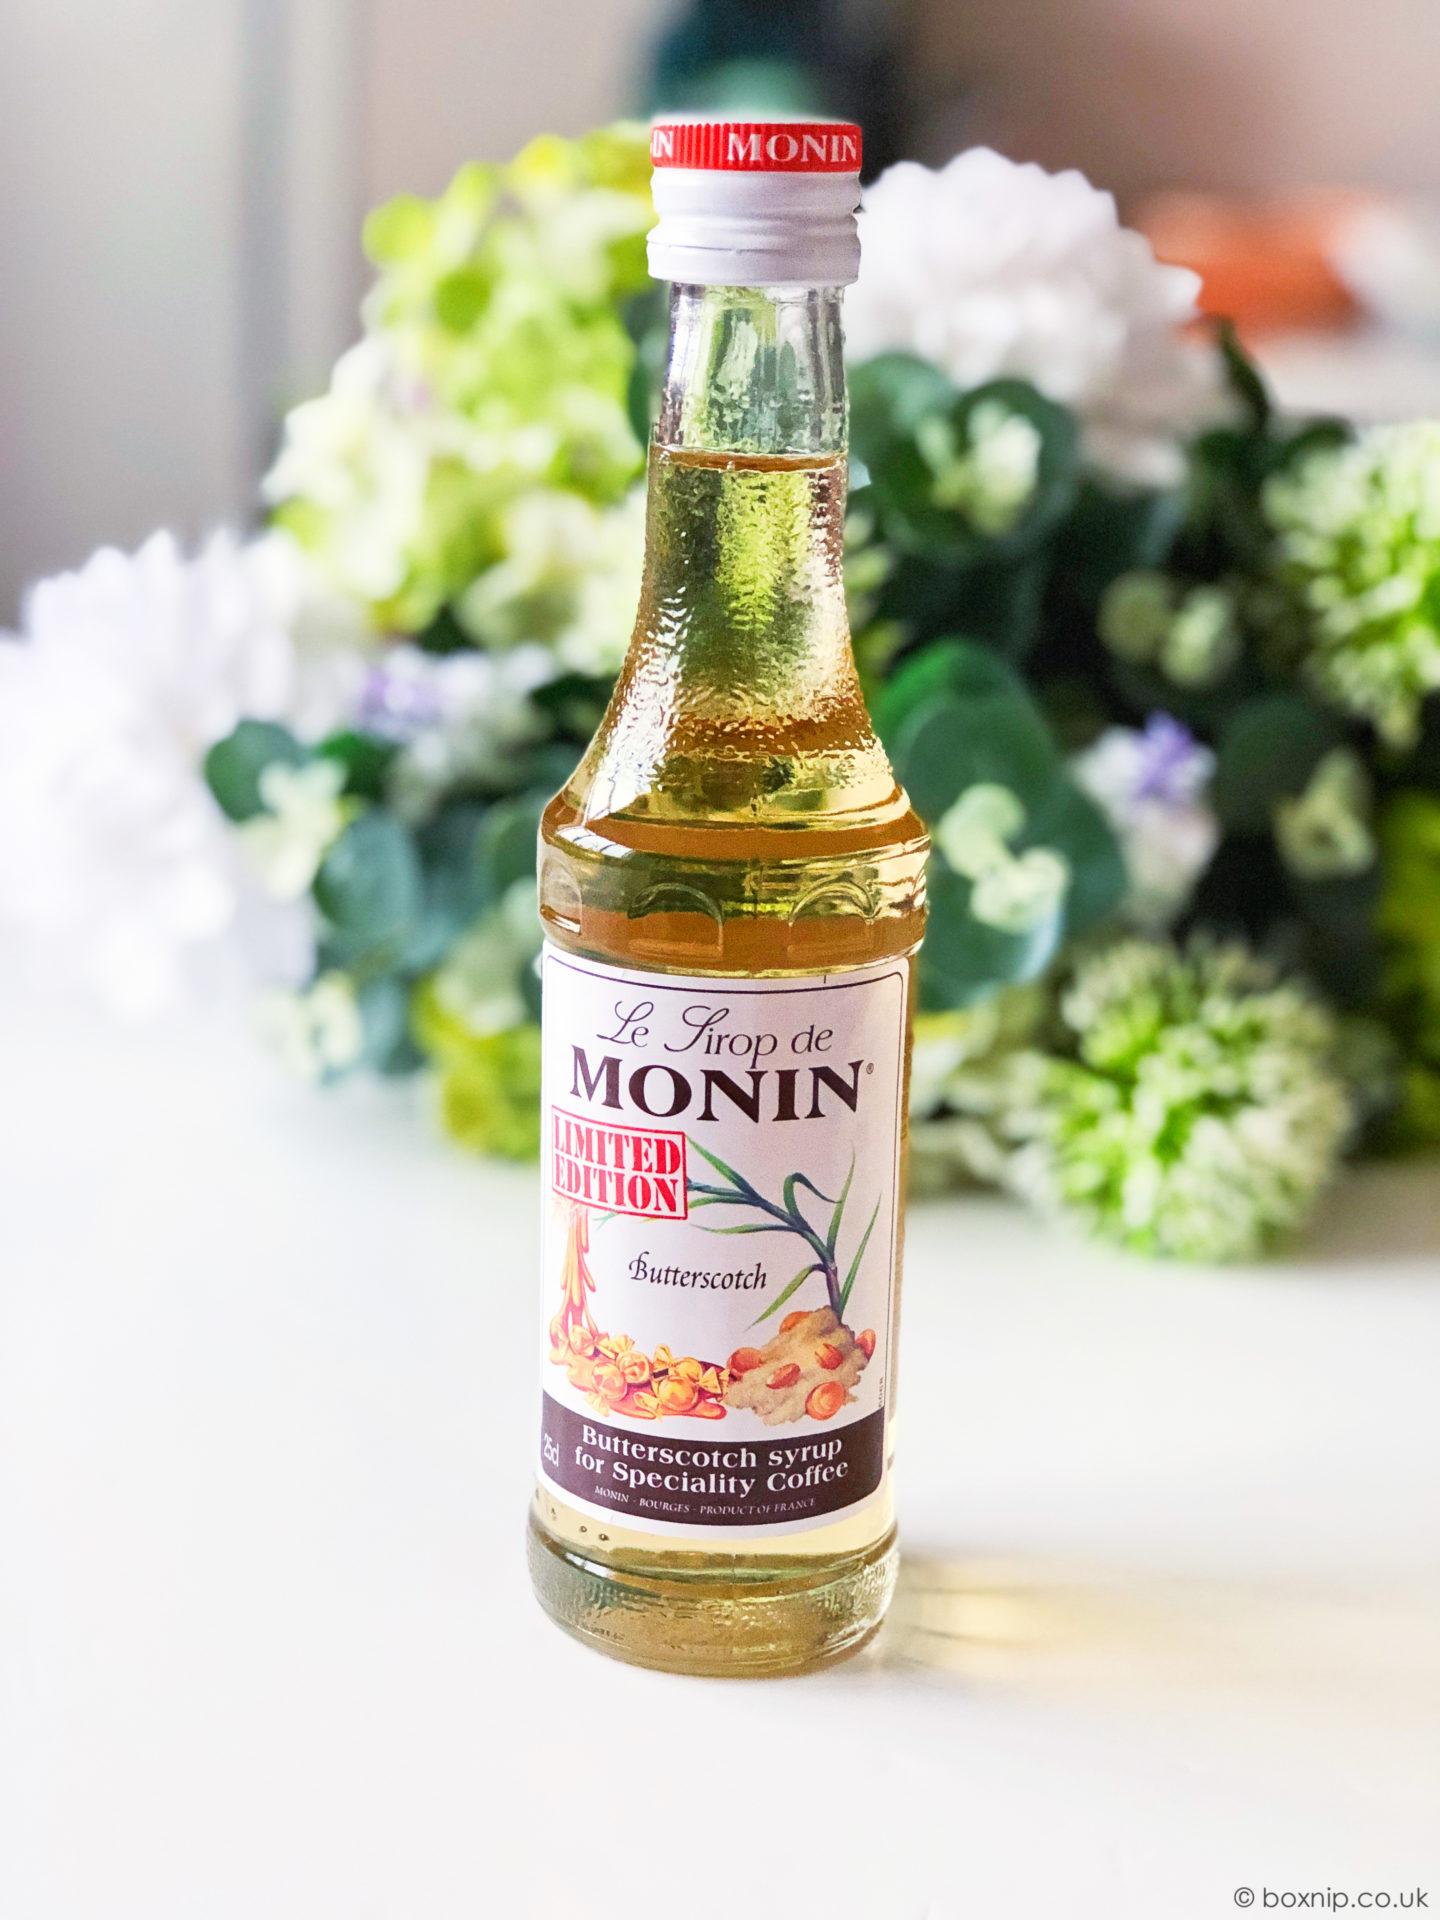 MONIN Butterscotch Coffee Syrup - July 2019 Degusta Box